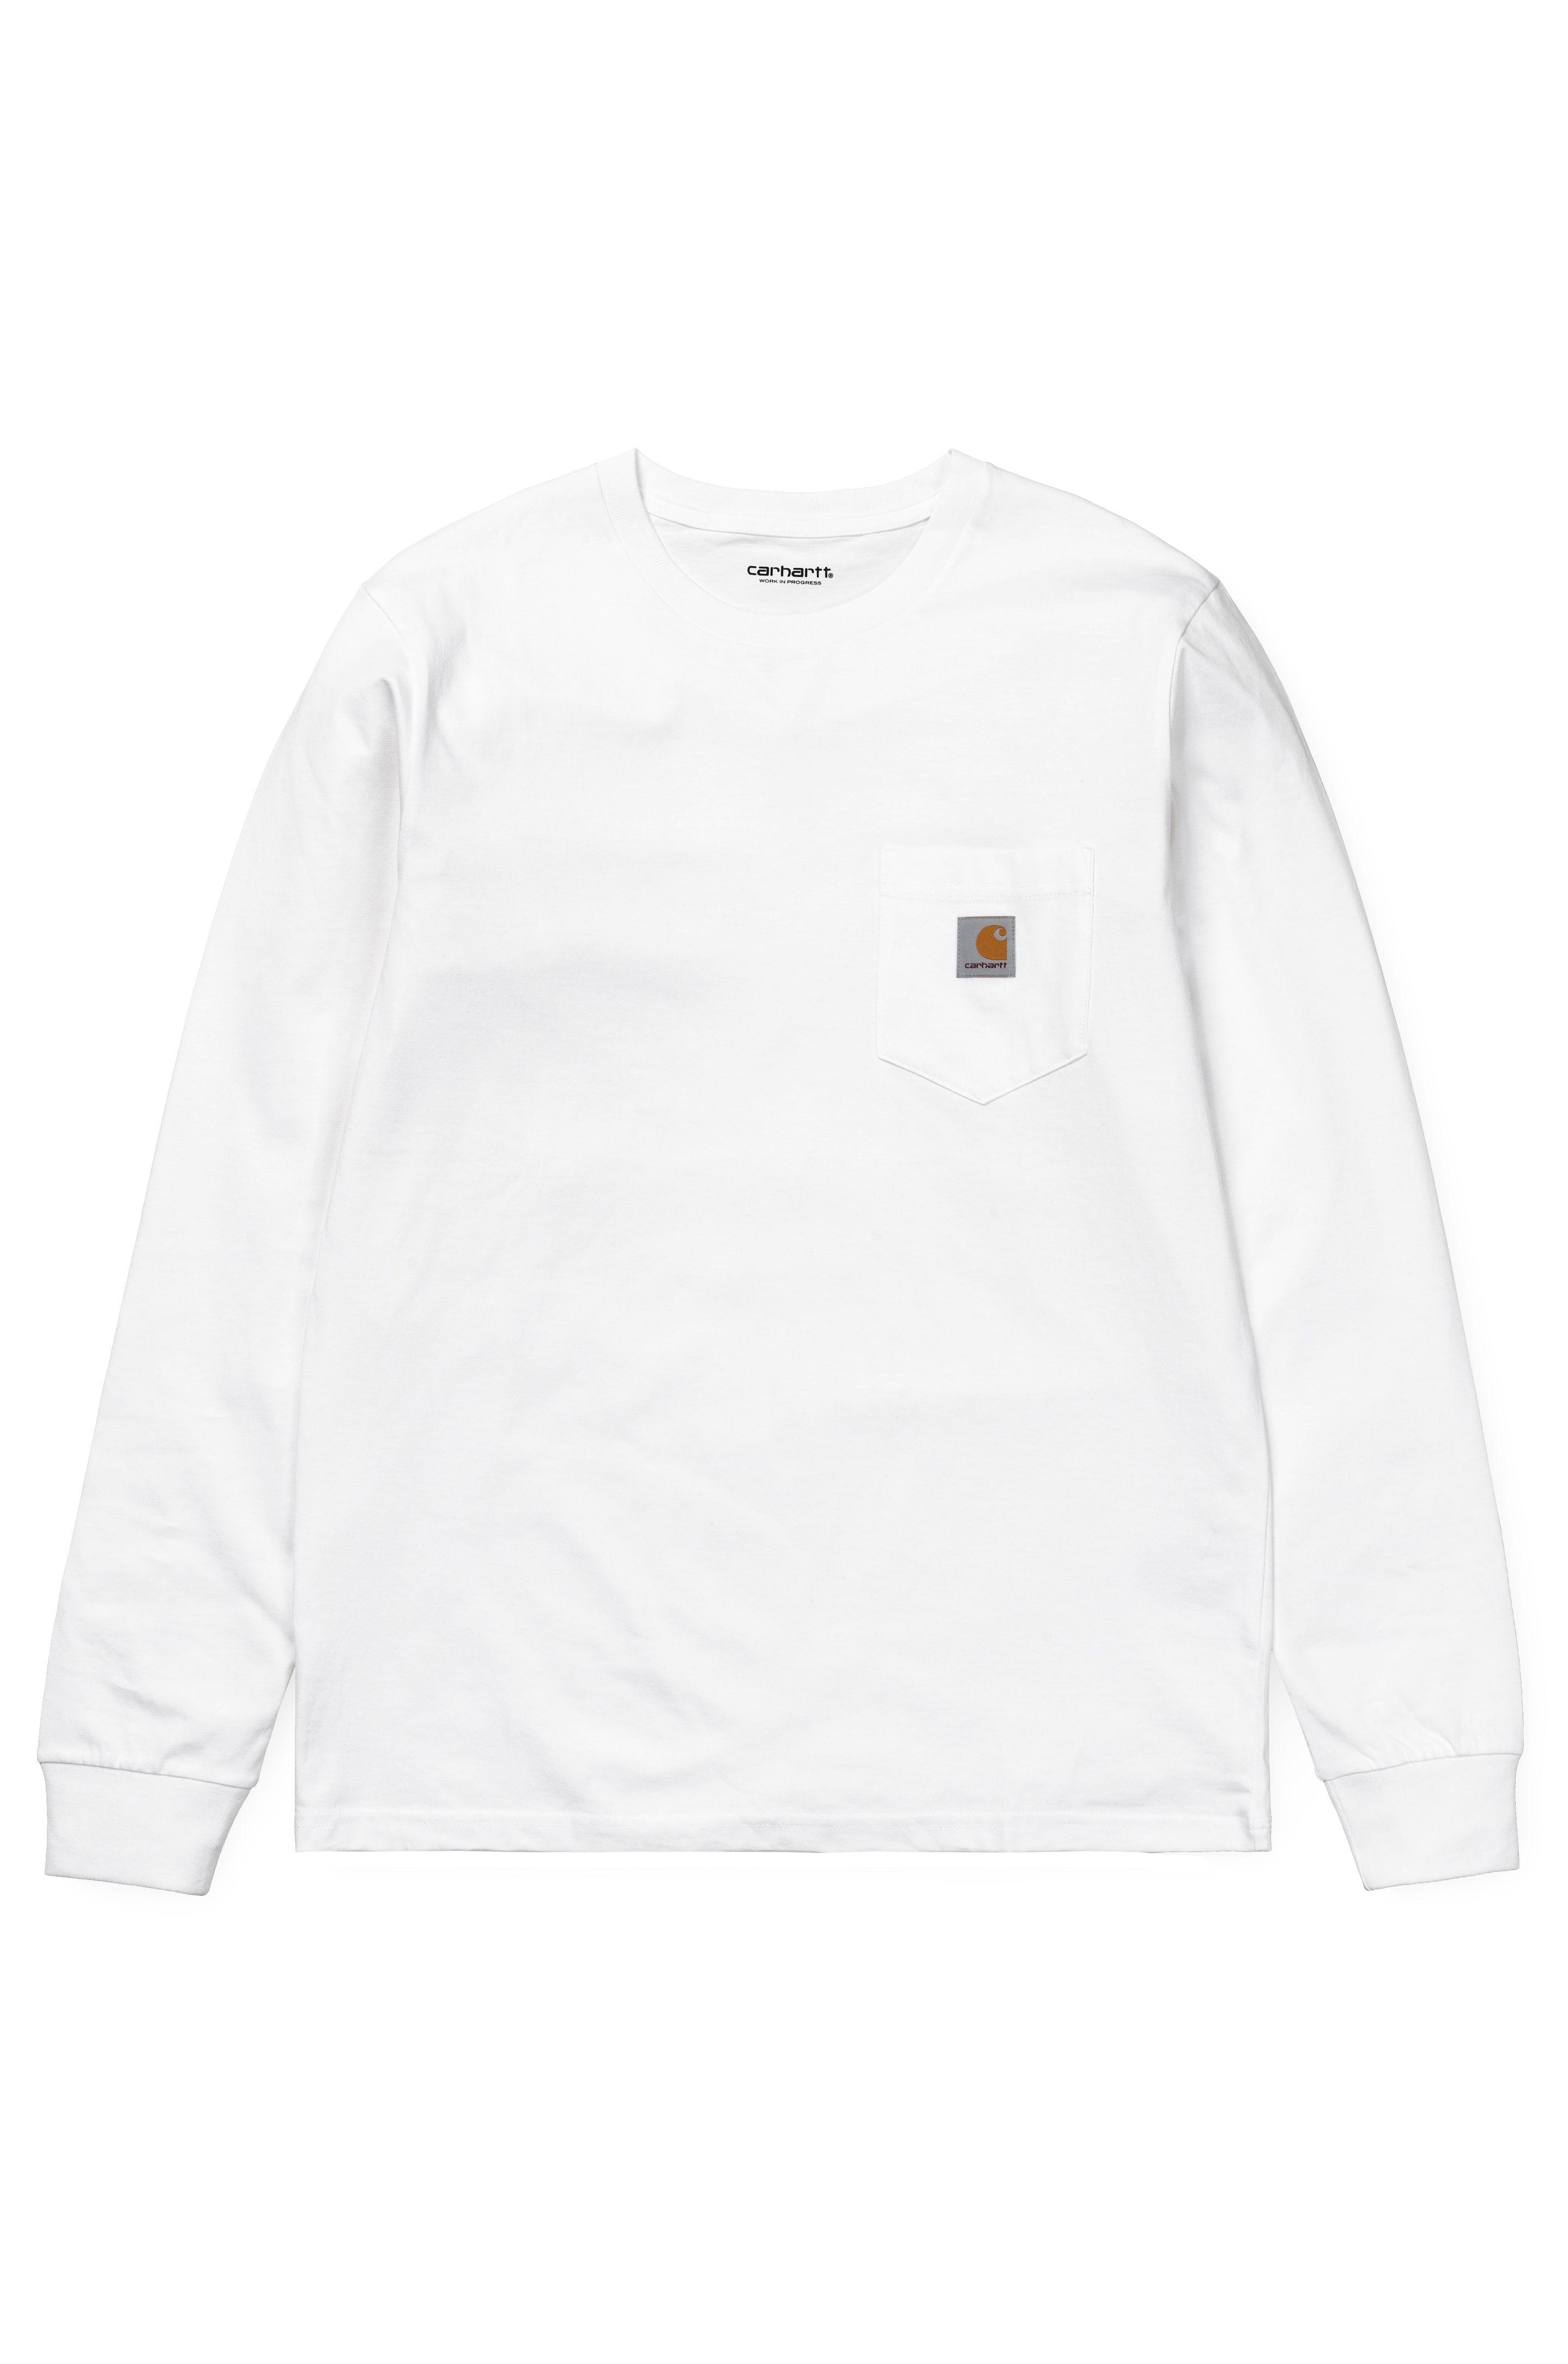 L-Sleeve Carhartt WIP POCKET White